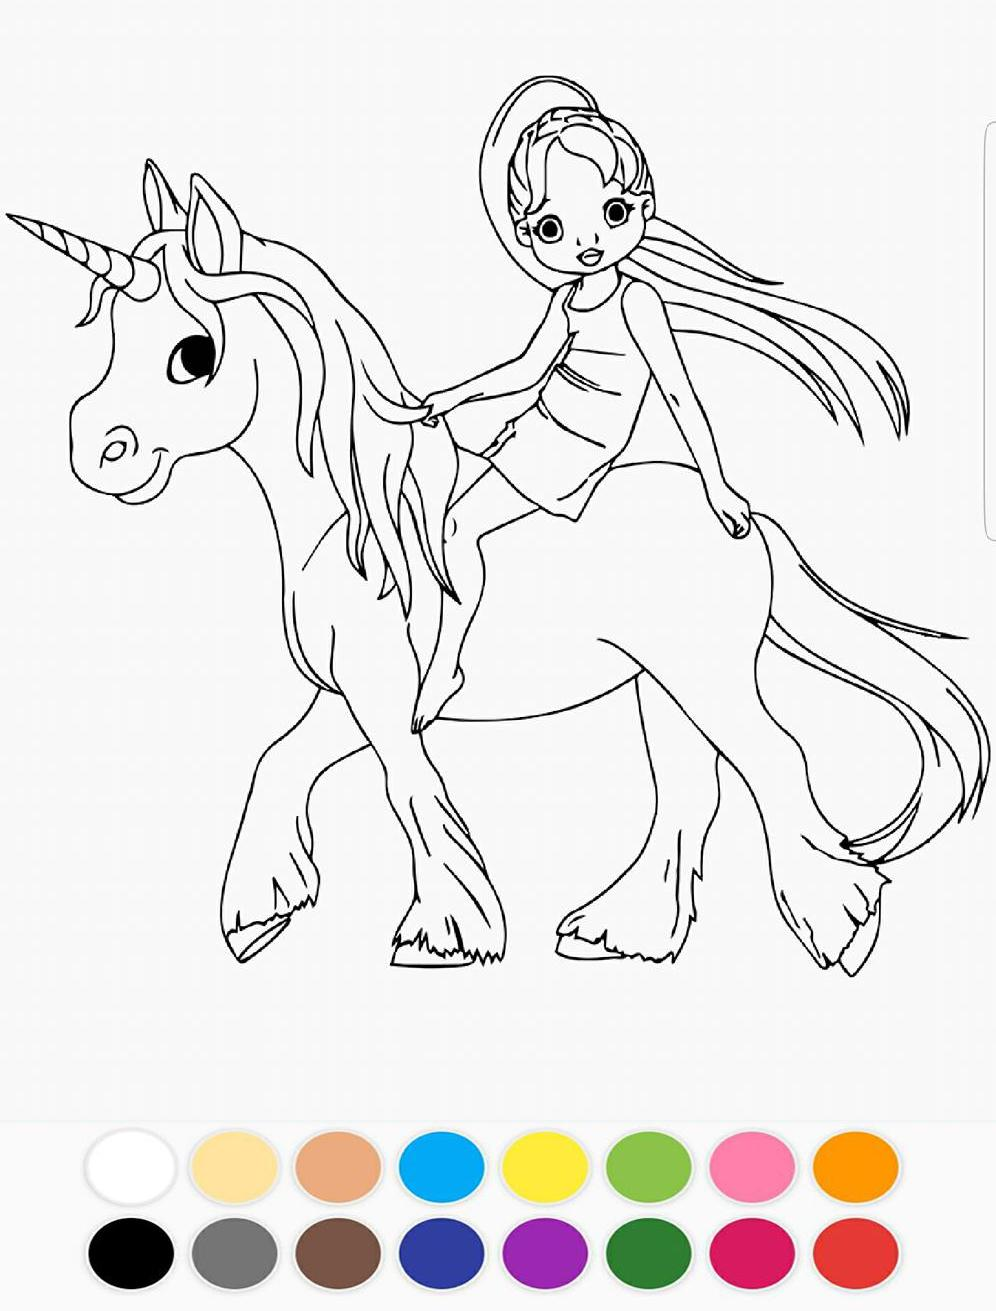 rose licorne coloriage dessin arc-en-ciel for Android ...